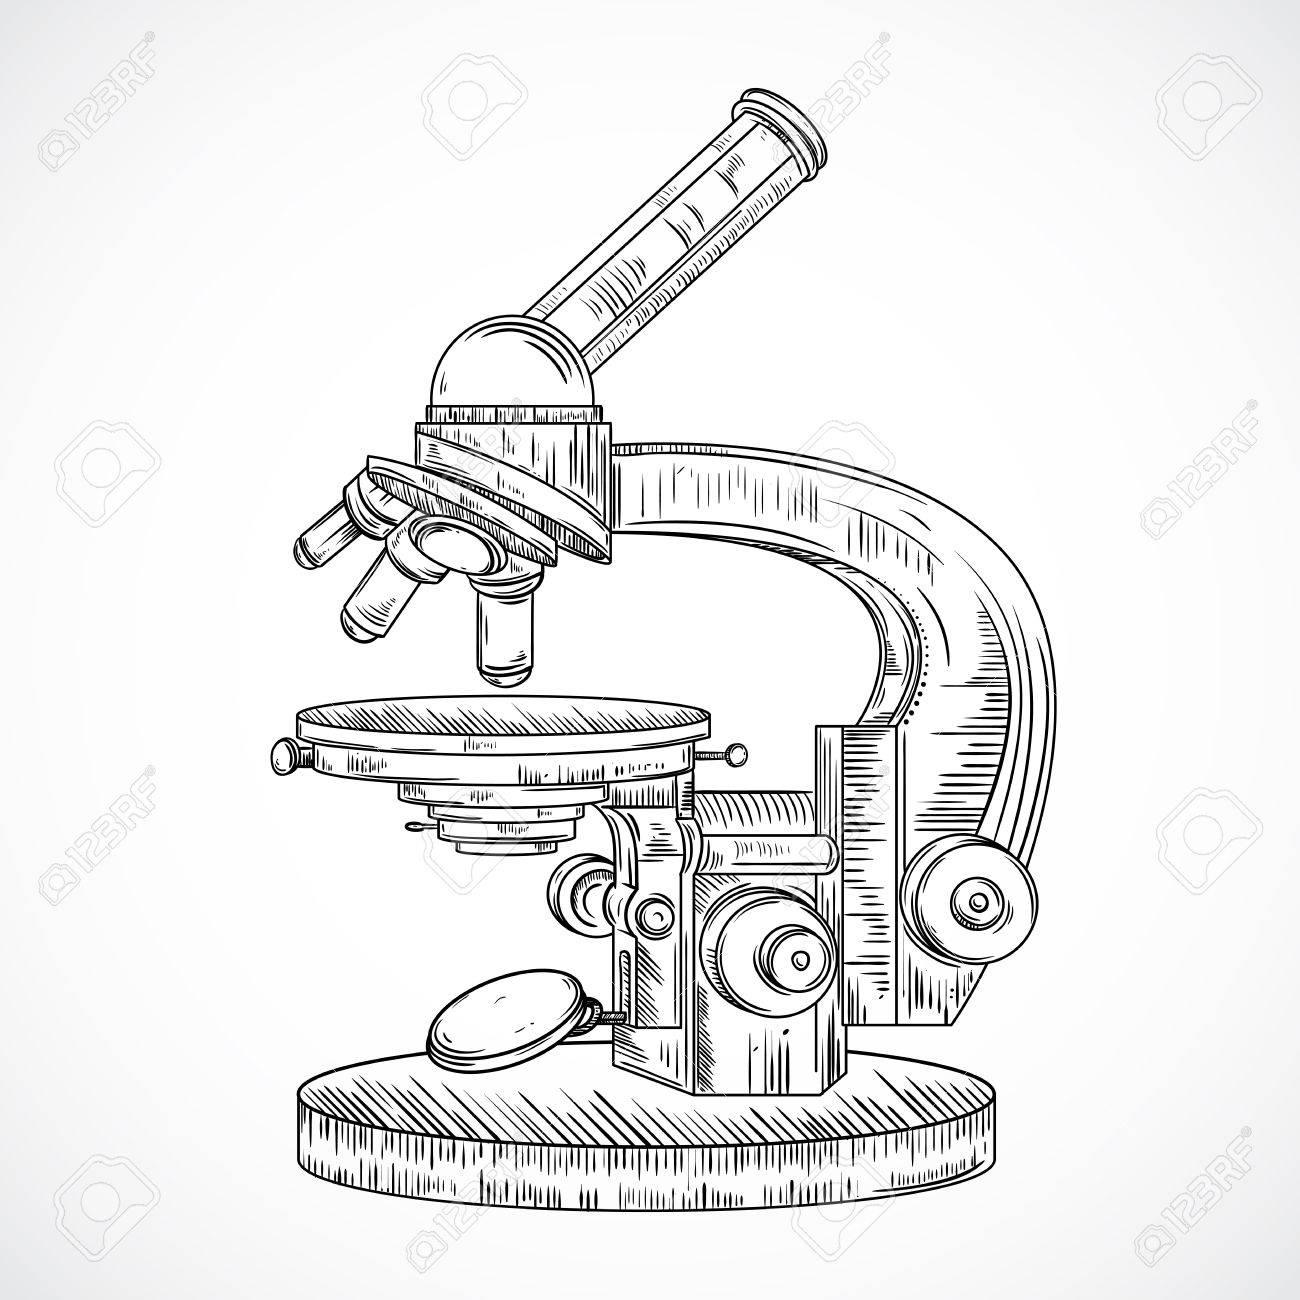 Microscope Drawing At Getdrawings